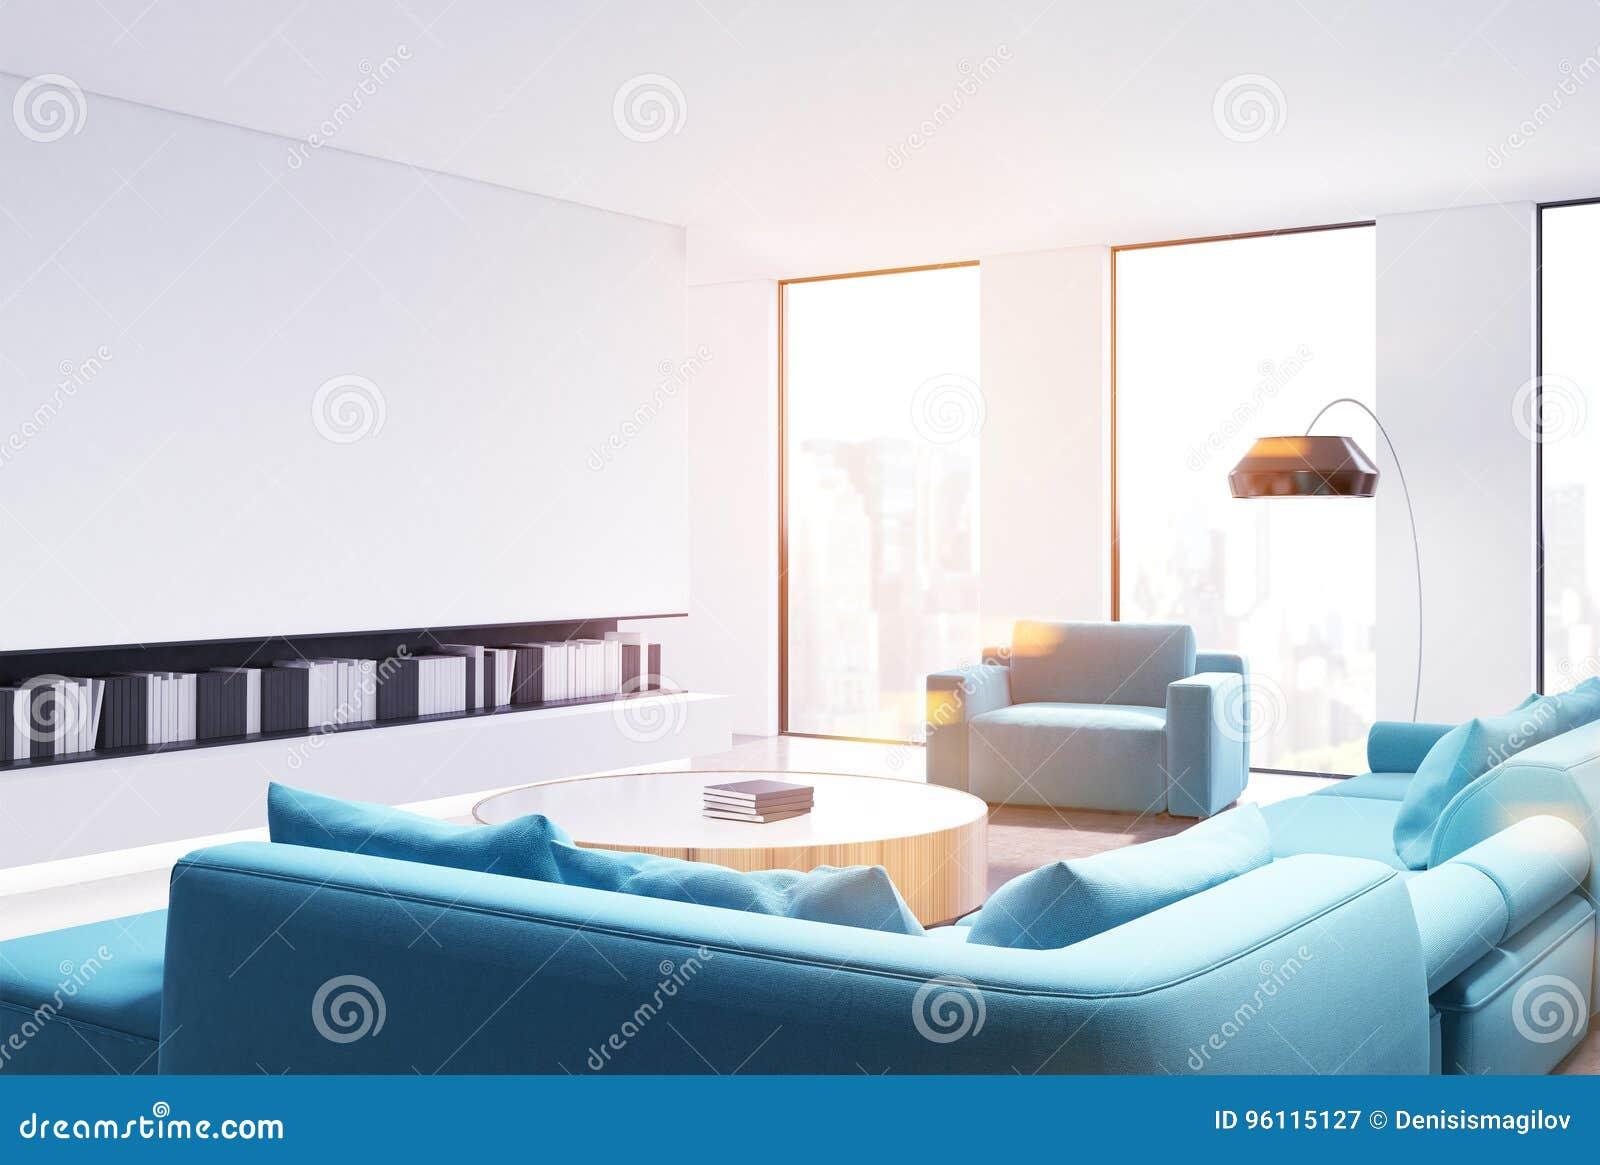 White Living Room Interior, Blue Sofa Side, Toned Stock Illustration ...